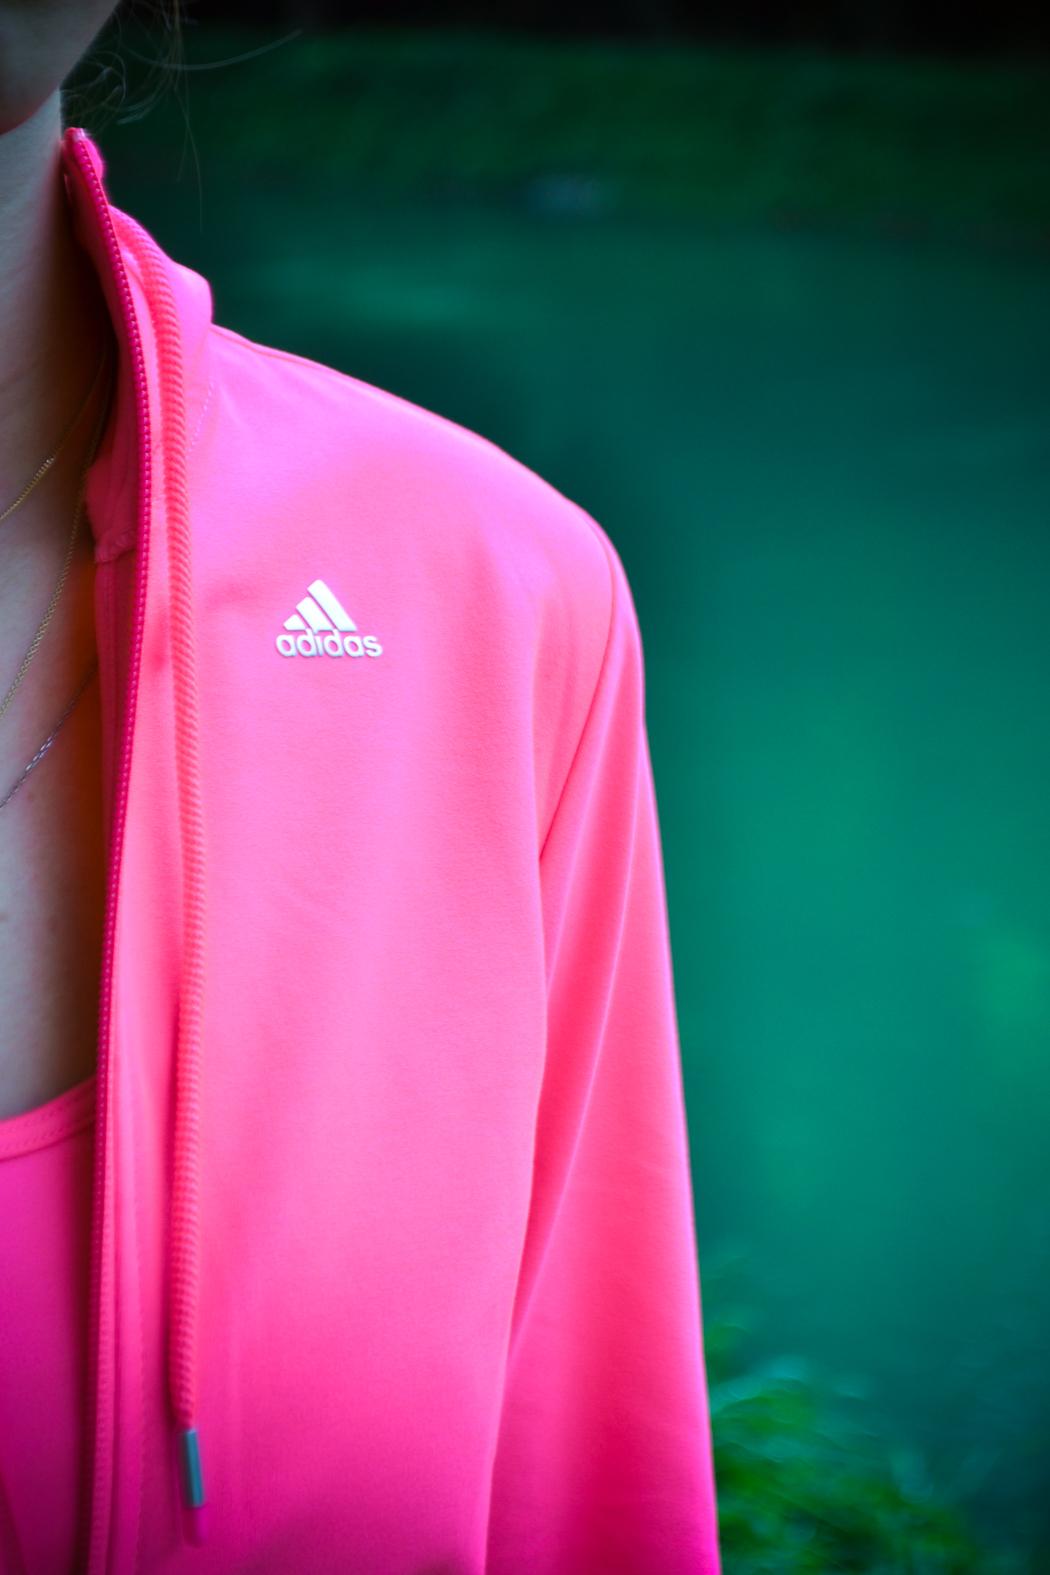 Lindarella-Fitnessblogger-Munich-München-Adidas-Boost-Laufschuhe-Pink-Sportoutfit-6